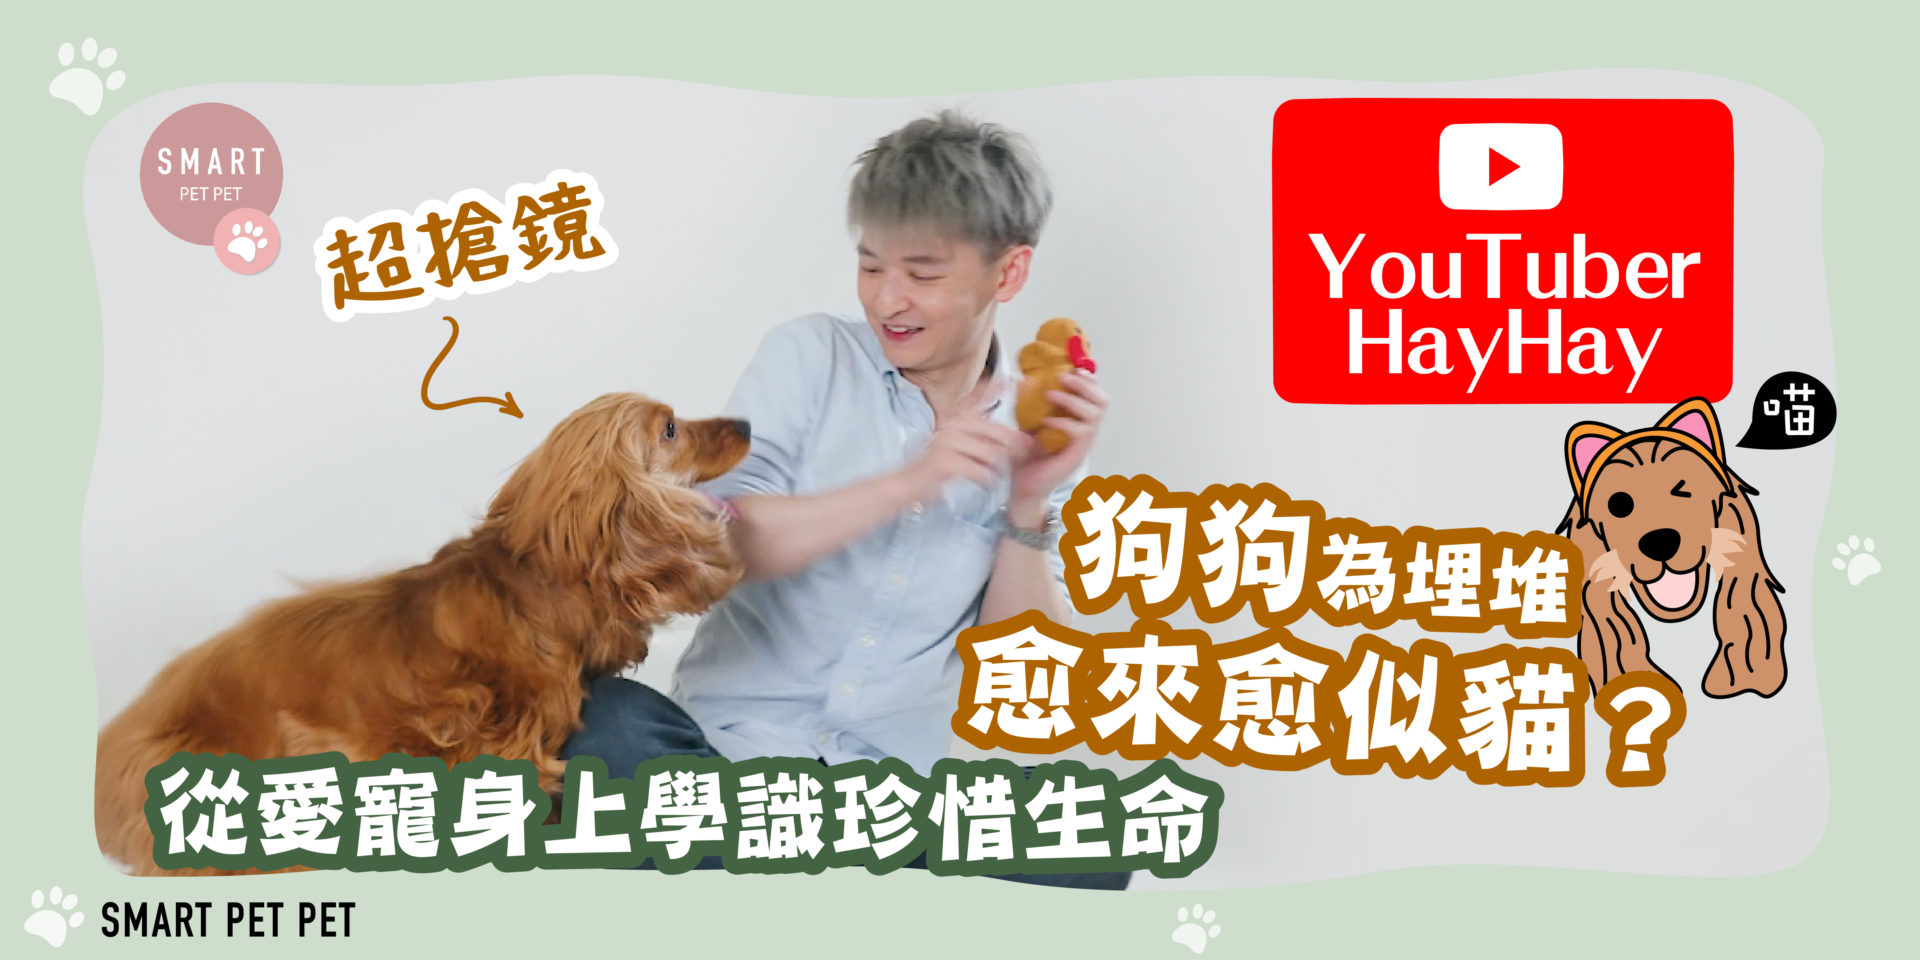 HayHay_狗_YouTuber_banner